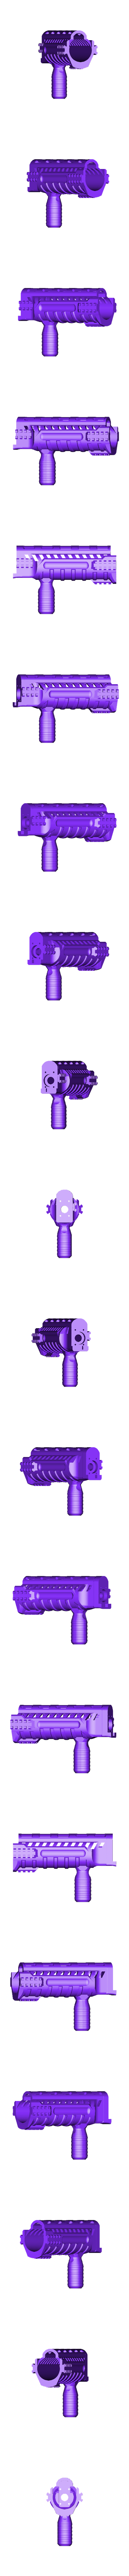 UNW_Long_shroud_NR_MID_B_grip_v2.stl Download free STL file FGC 9 UNW No rail Long and medium Shroud • 3D printer model, UntangleART